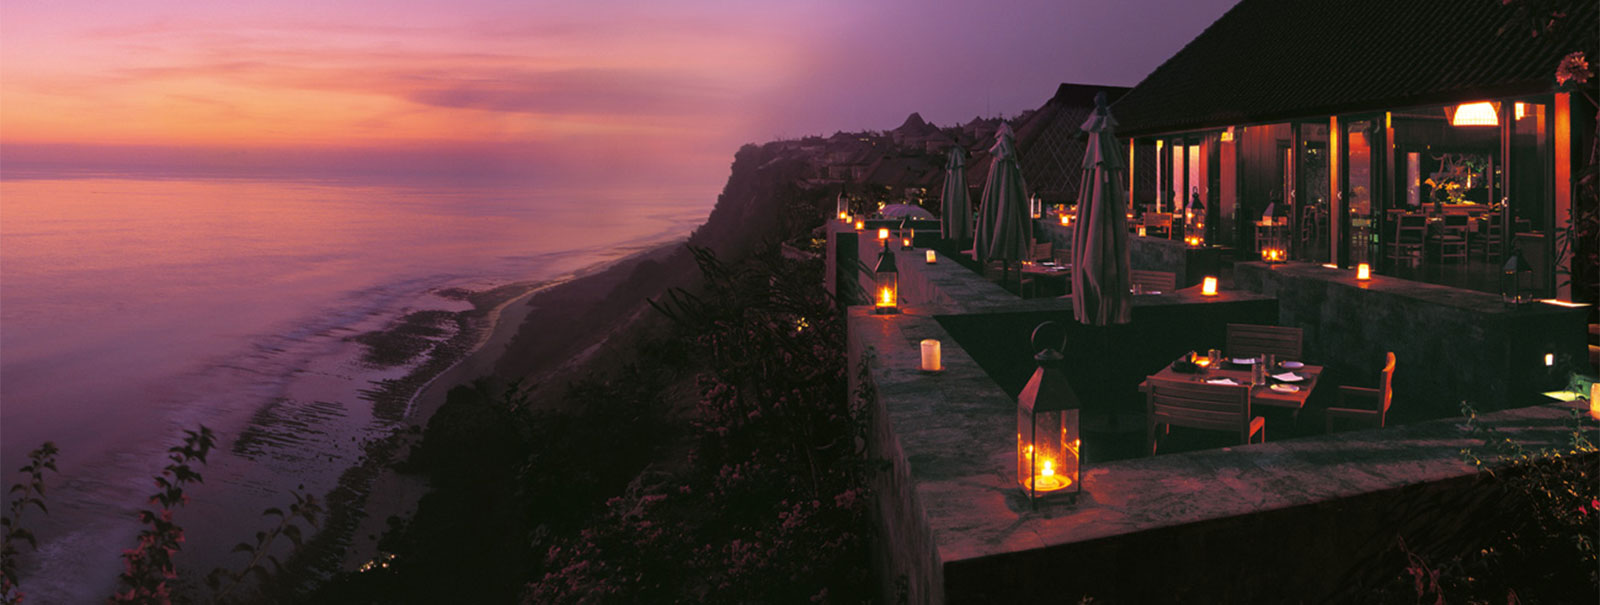 巴厘岛宝格丽度假别墅<br/>Bulgari Resort Bali